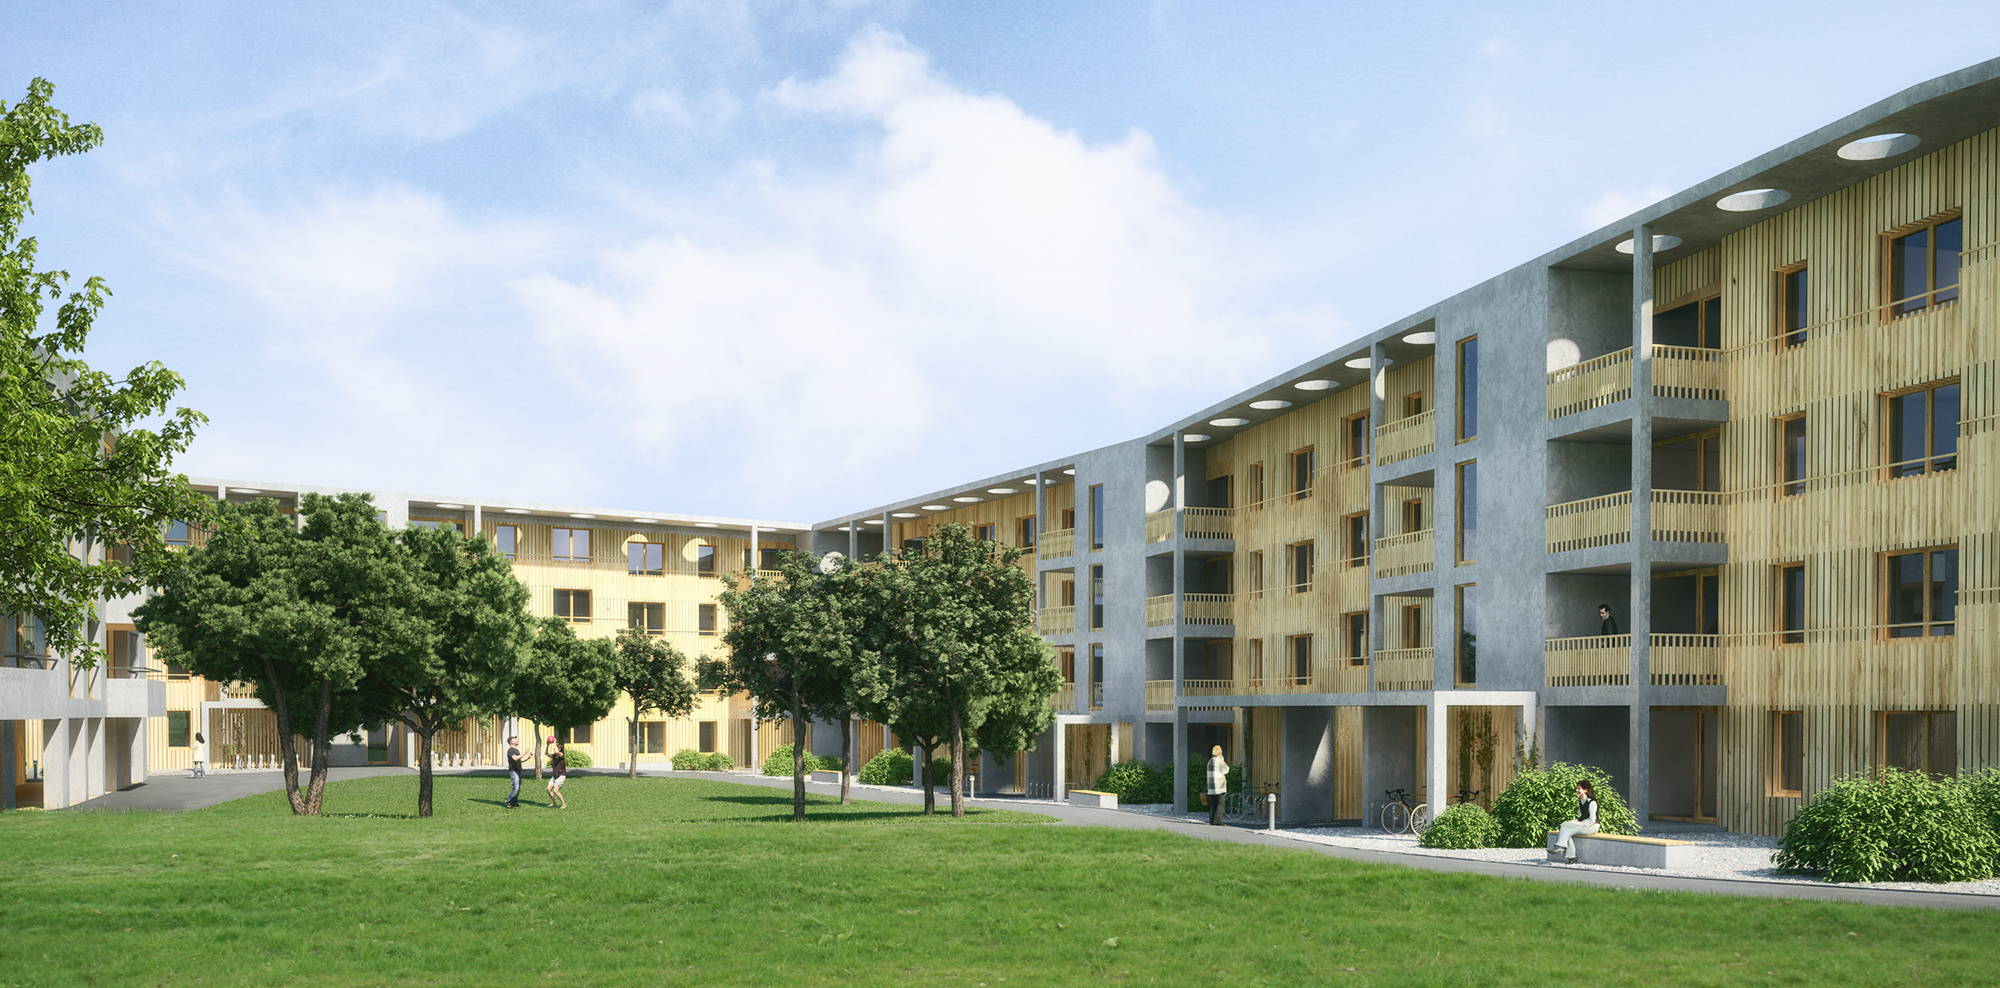 Anjana Perera Visualisierung - Sonnenfeld - Air Architekten AG, Kreuzlingen